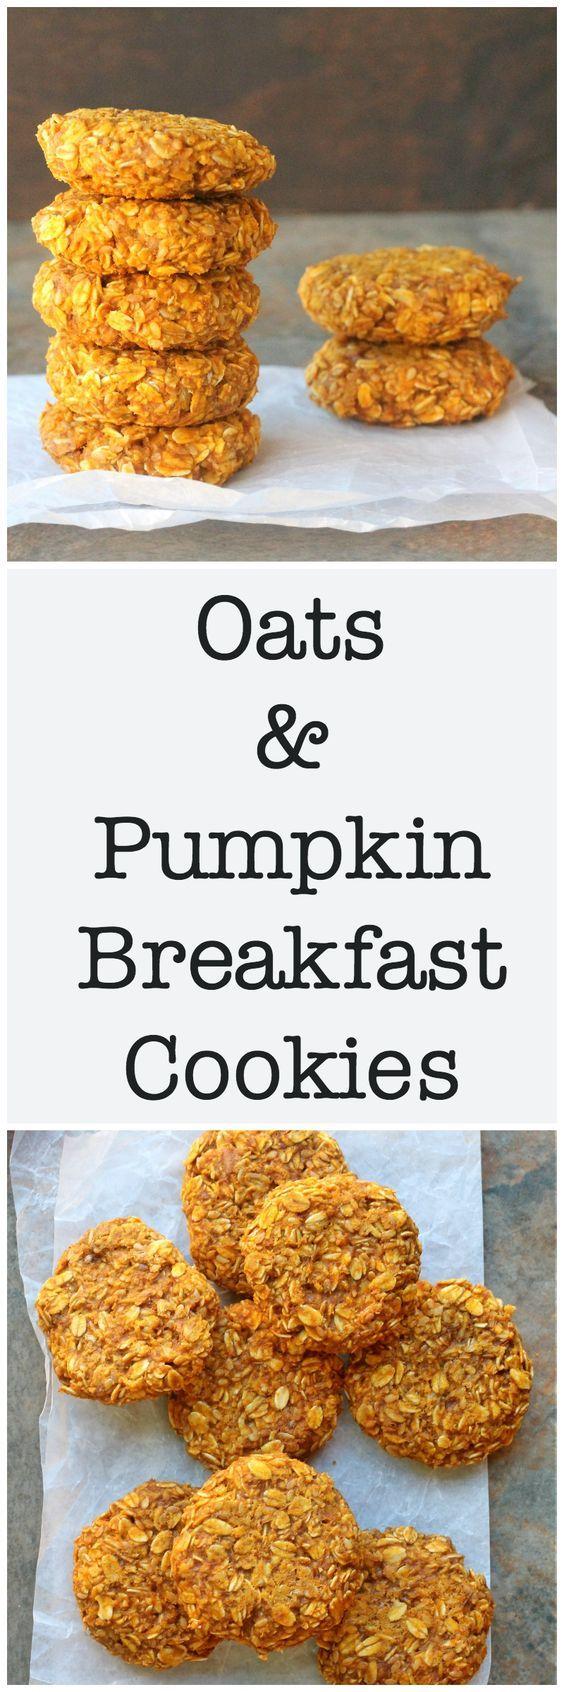 Oats & Pumpkin Breakfast Cookies - Vegan, Gluten-Free!: